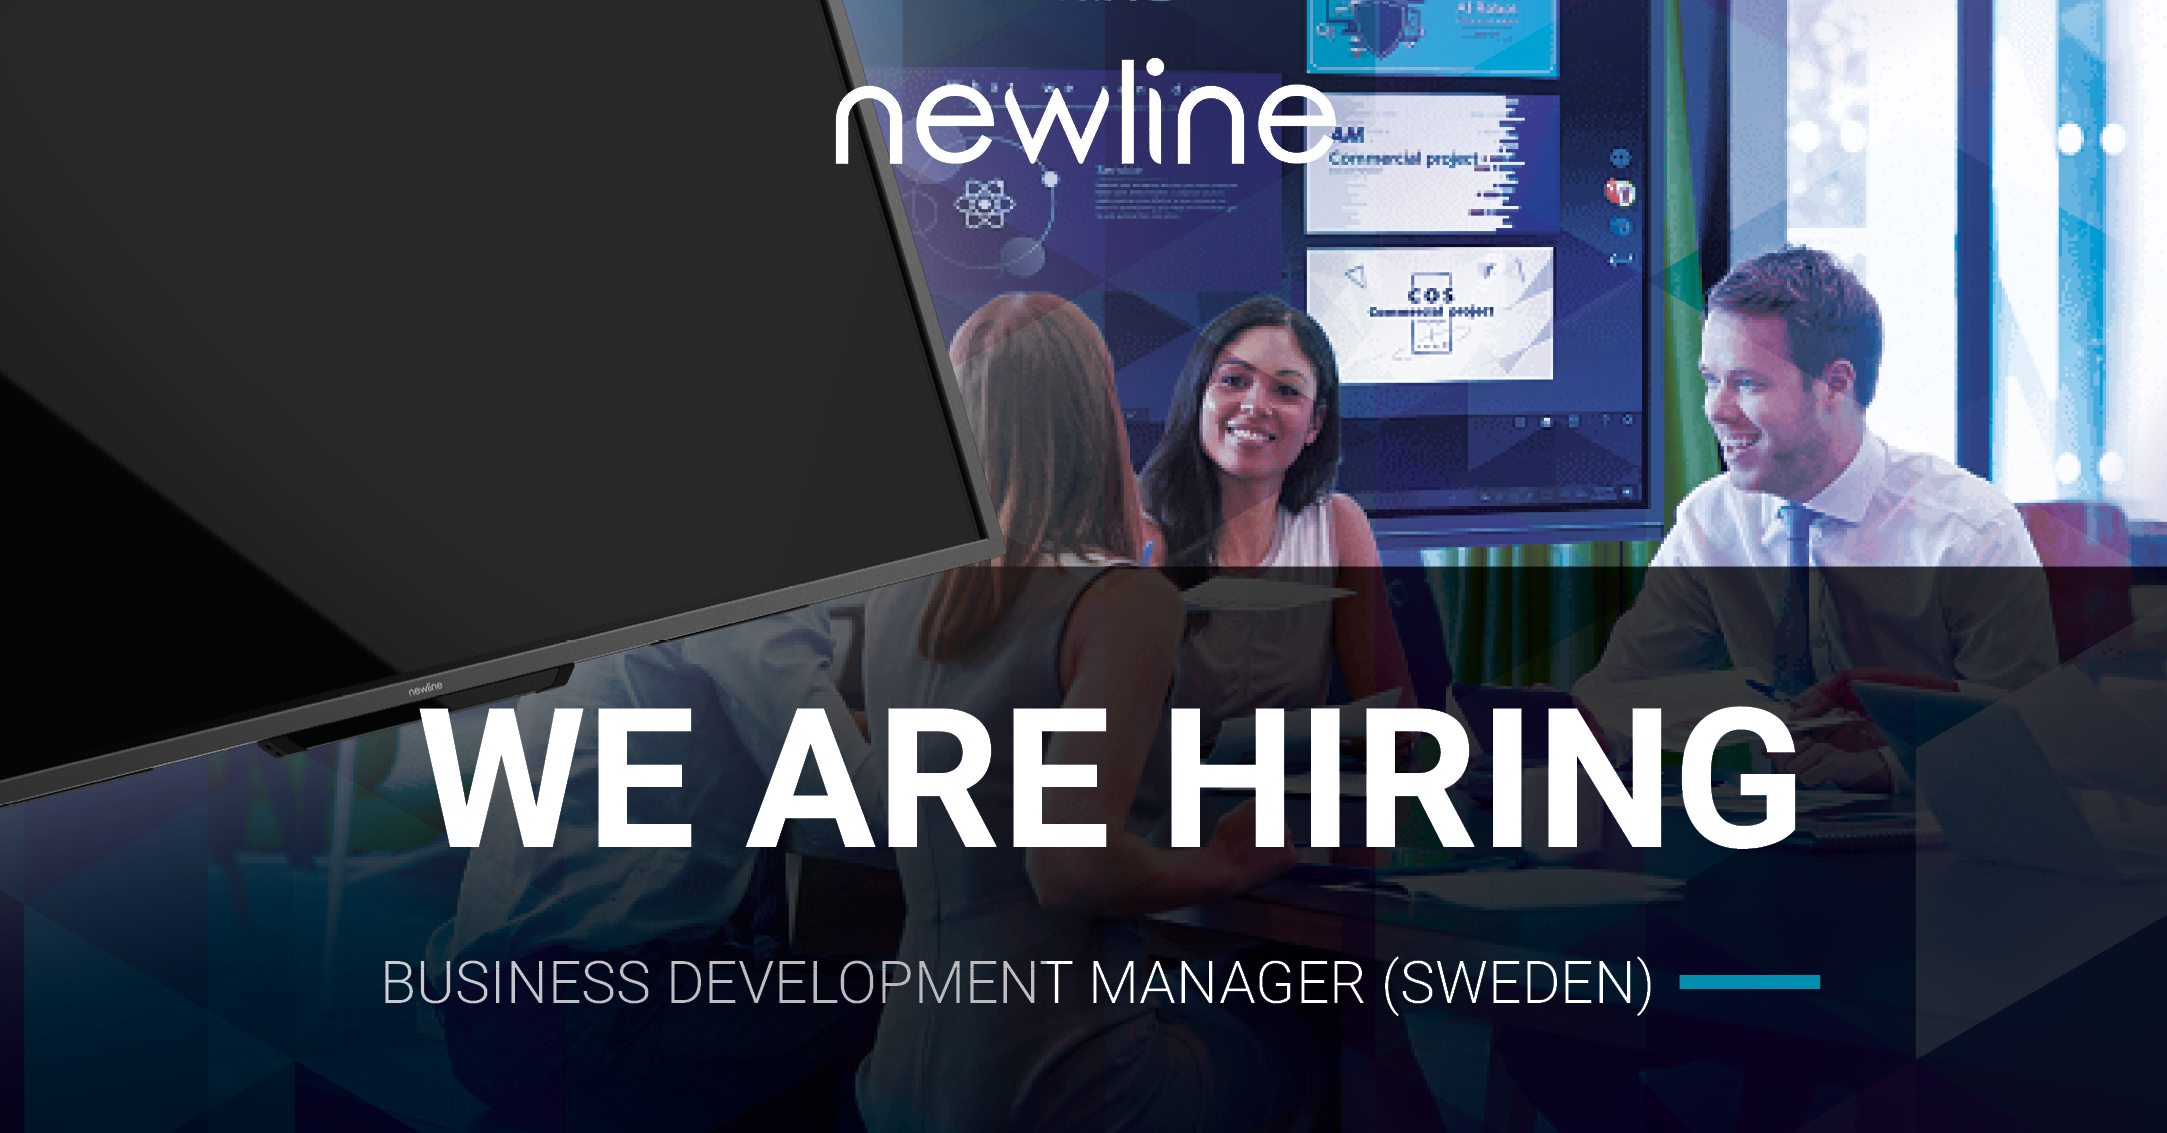 Newline is Hiring! Business Development Manager (Sweden)